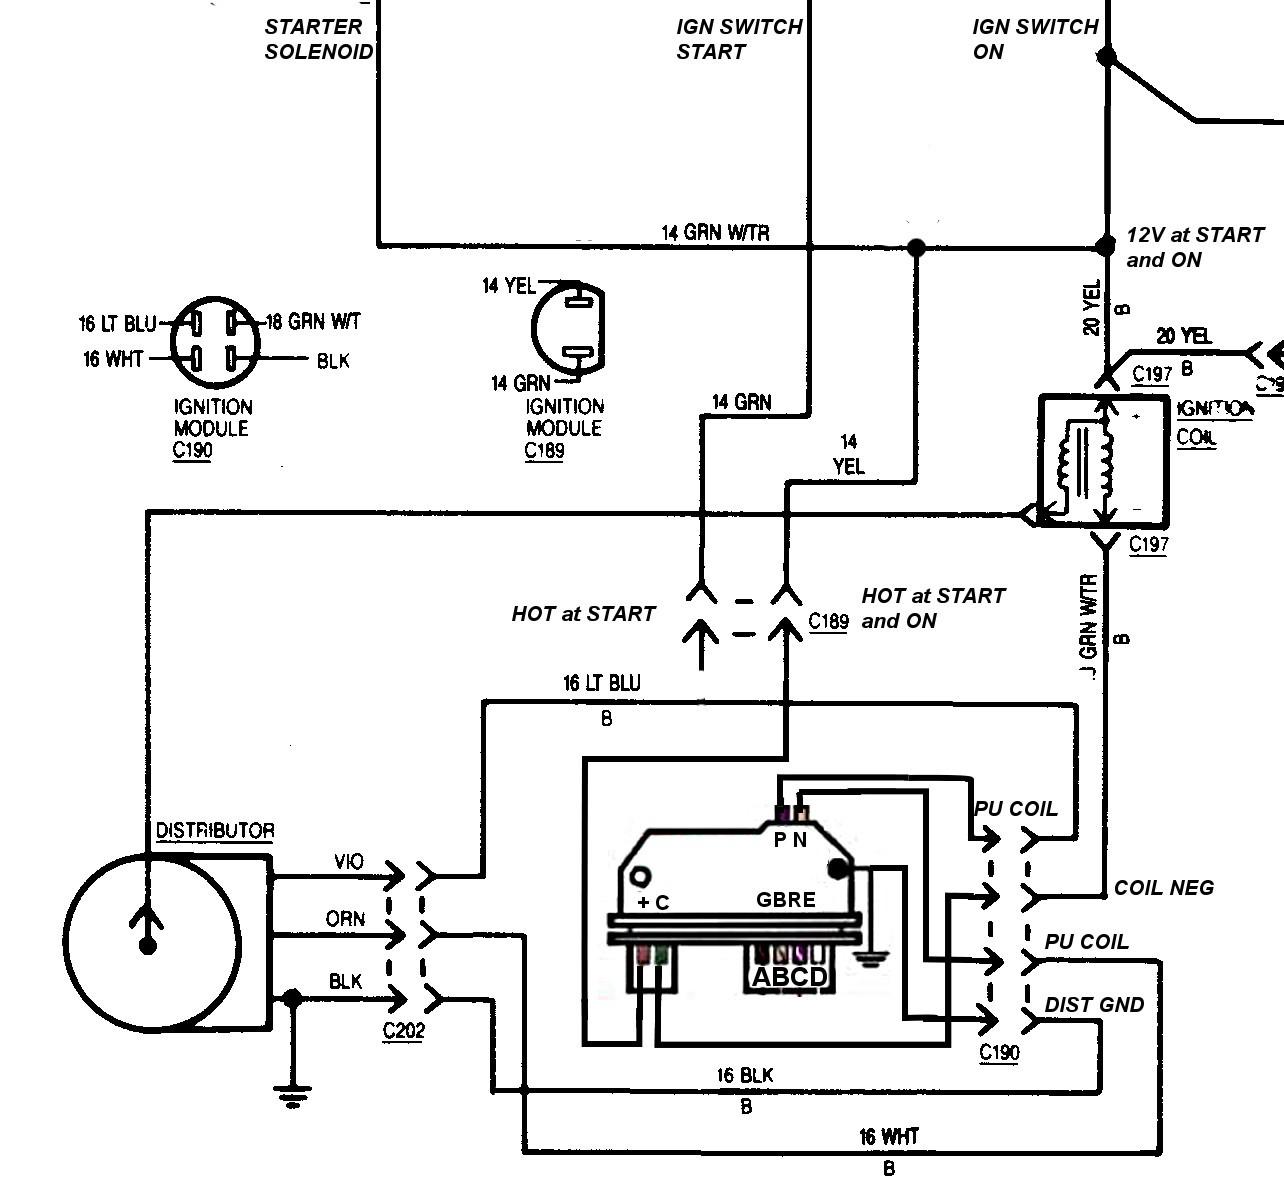 Chevy 350 Hei Distributor Wiring Diagram Inspirational